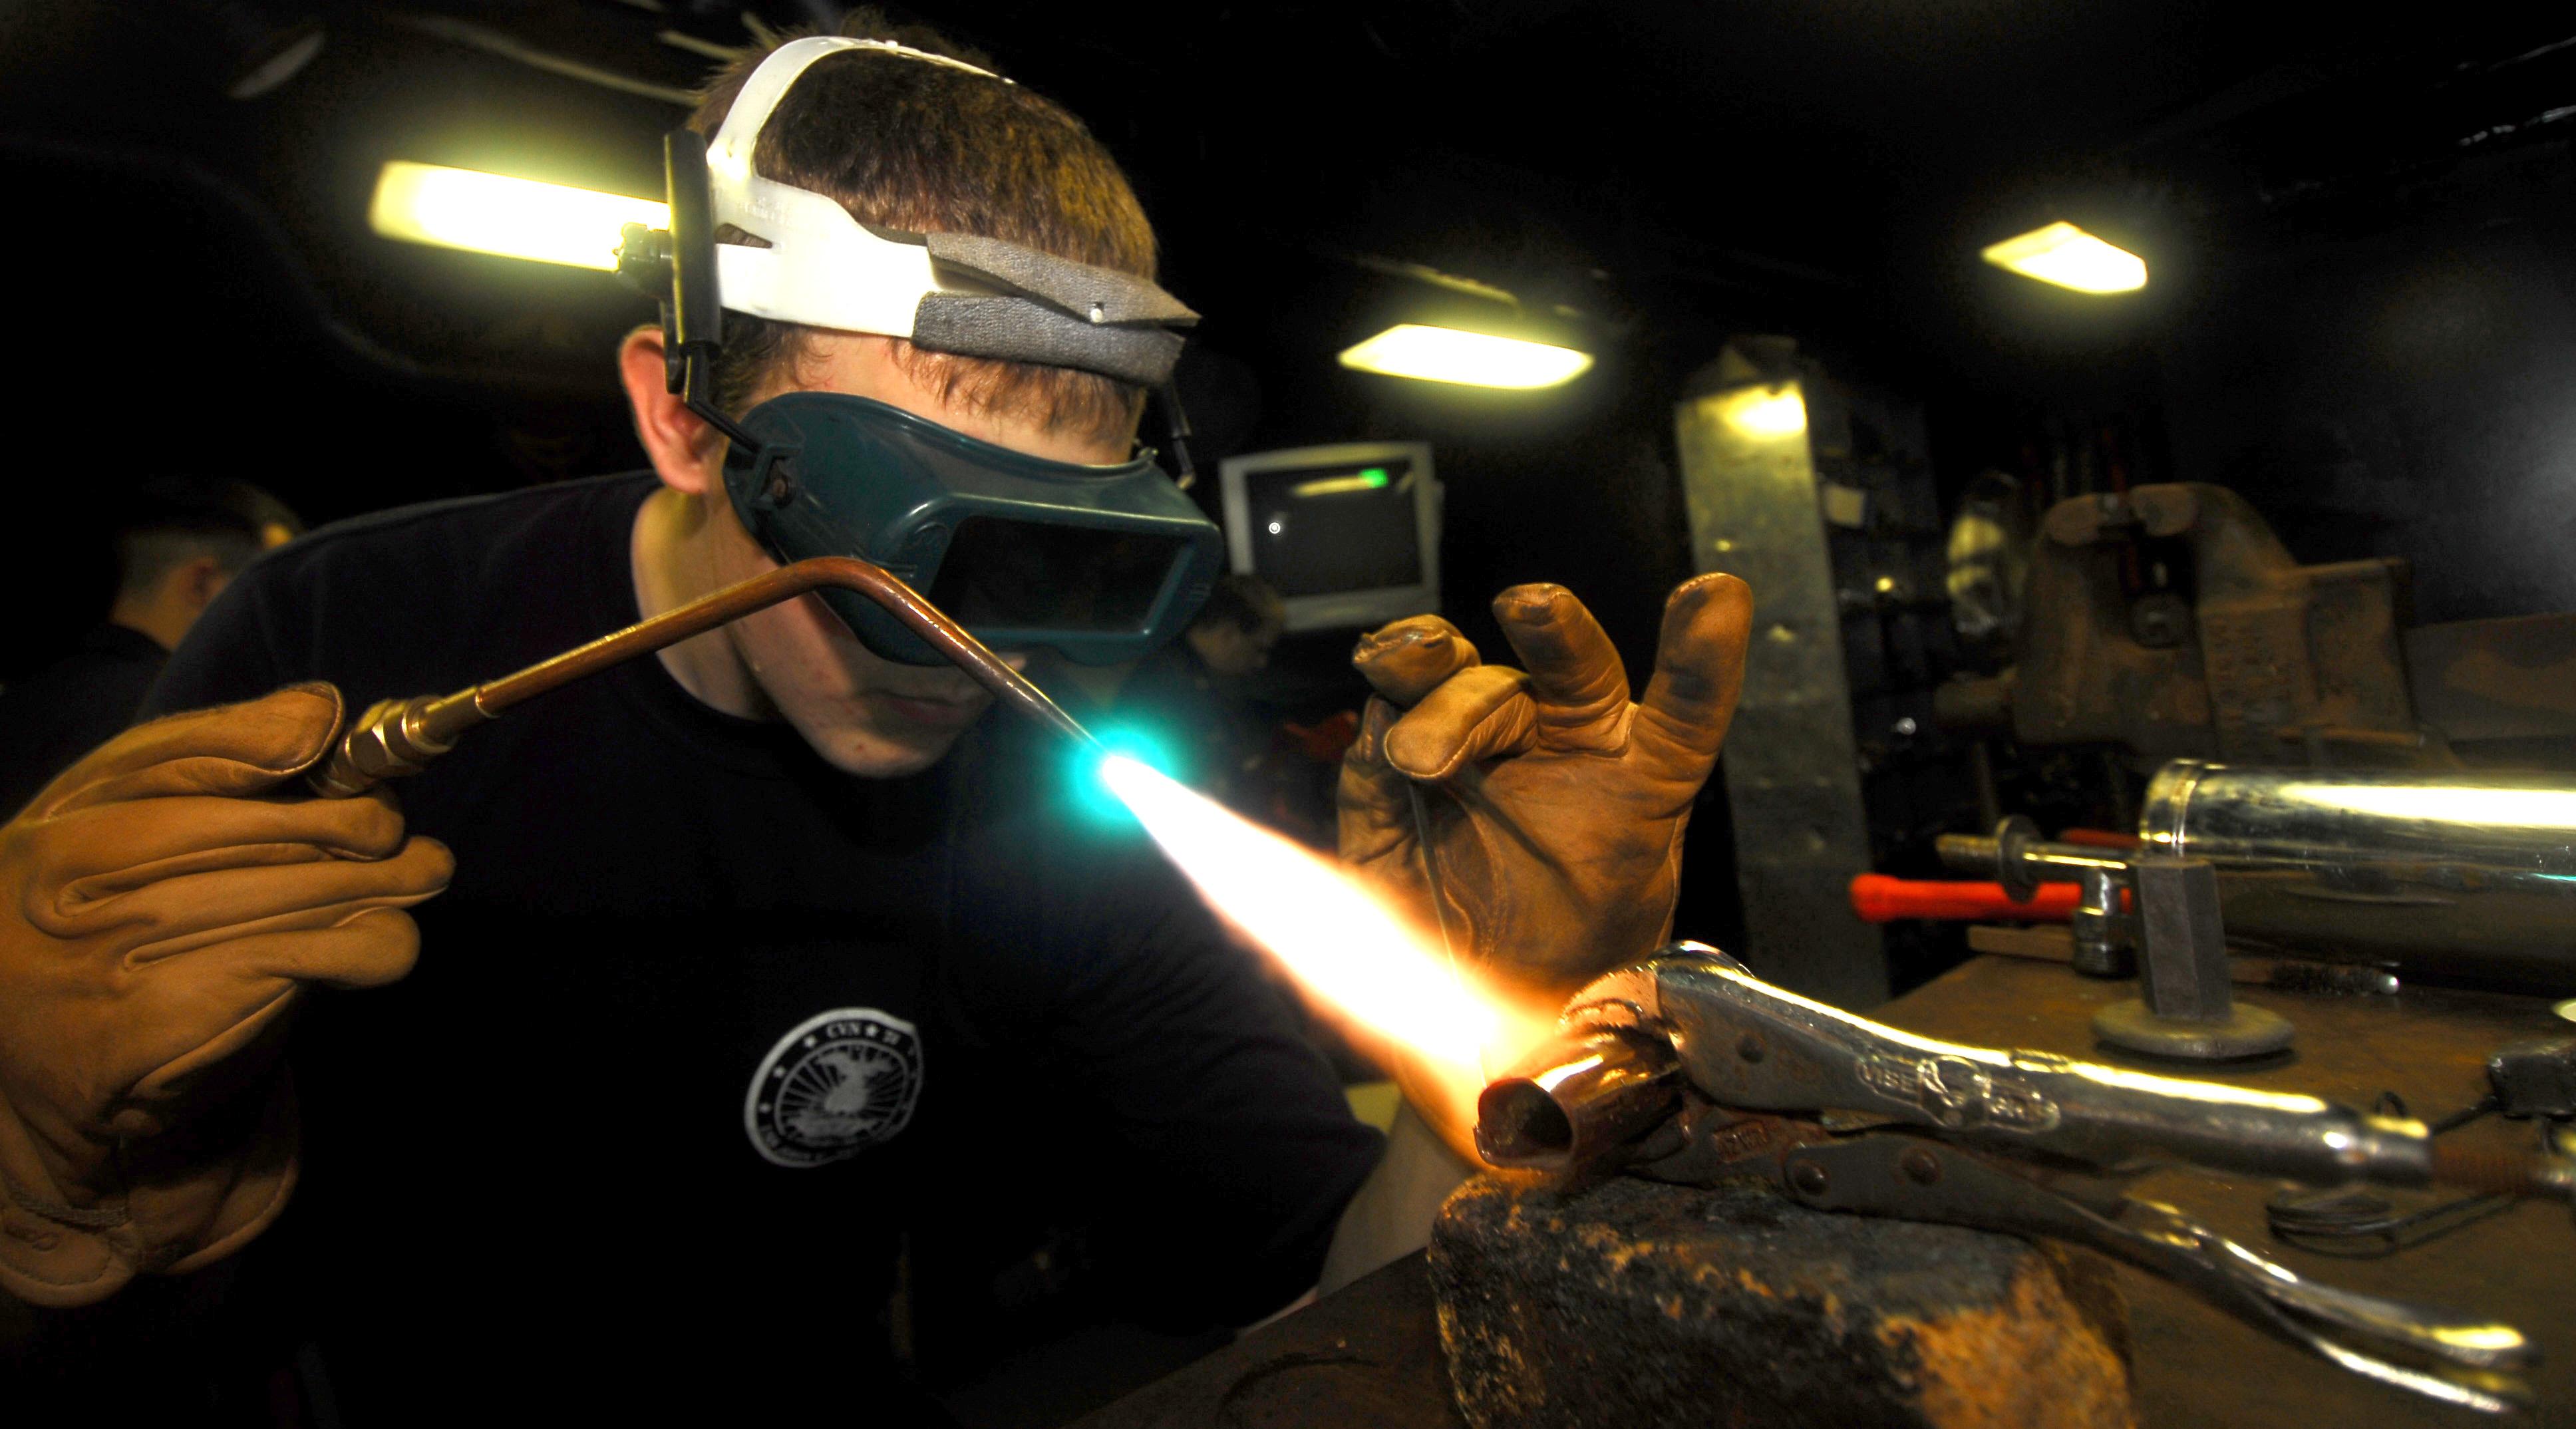 welding torch: